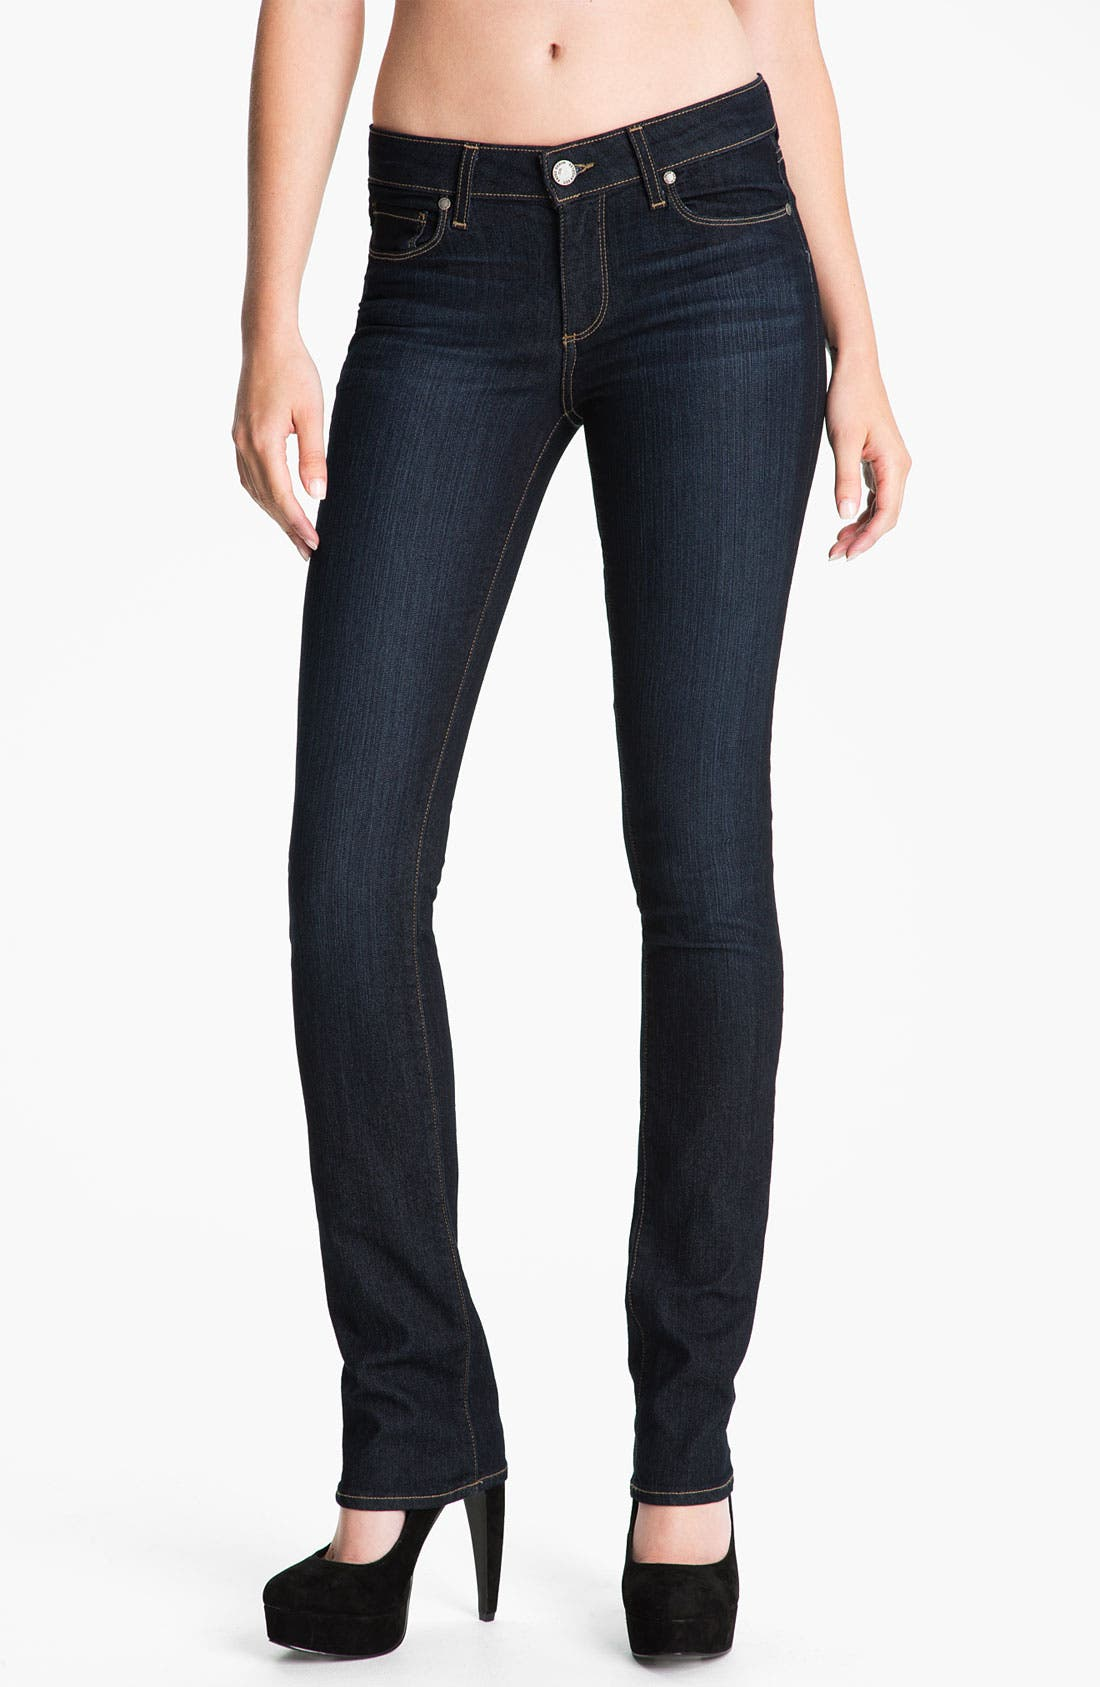 Alternate Image 1 Selected - PAIGE 'Skyline' Straight Leg Stretch Denim Jeans (Stream Wash)